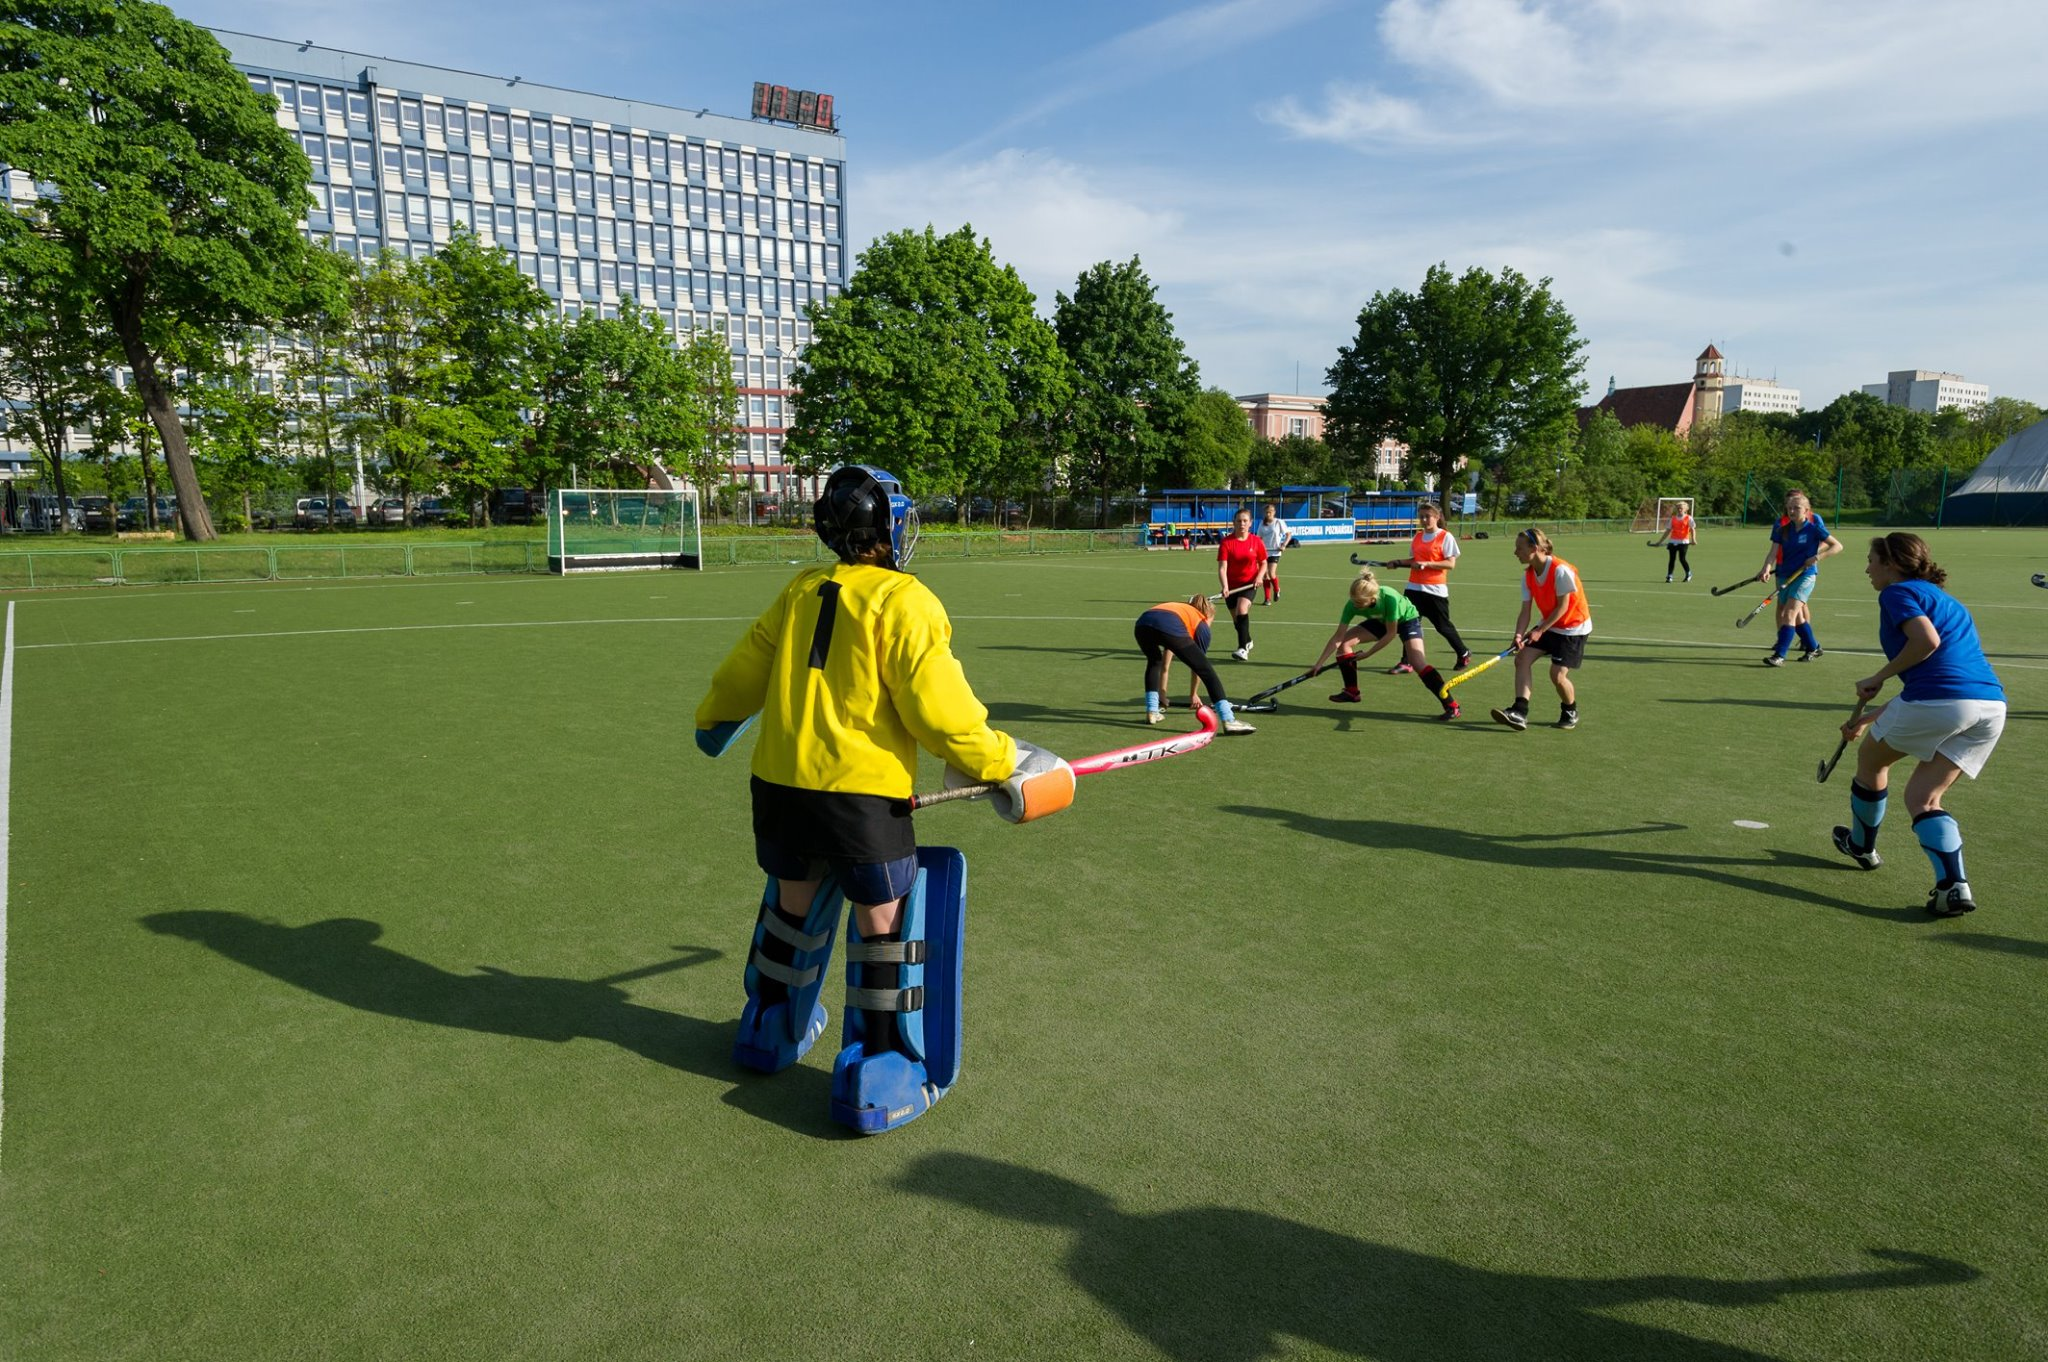 Poznan University of Technology – PUT Campus